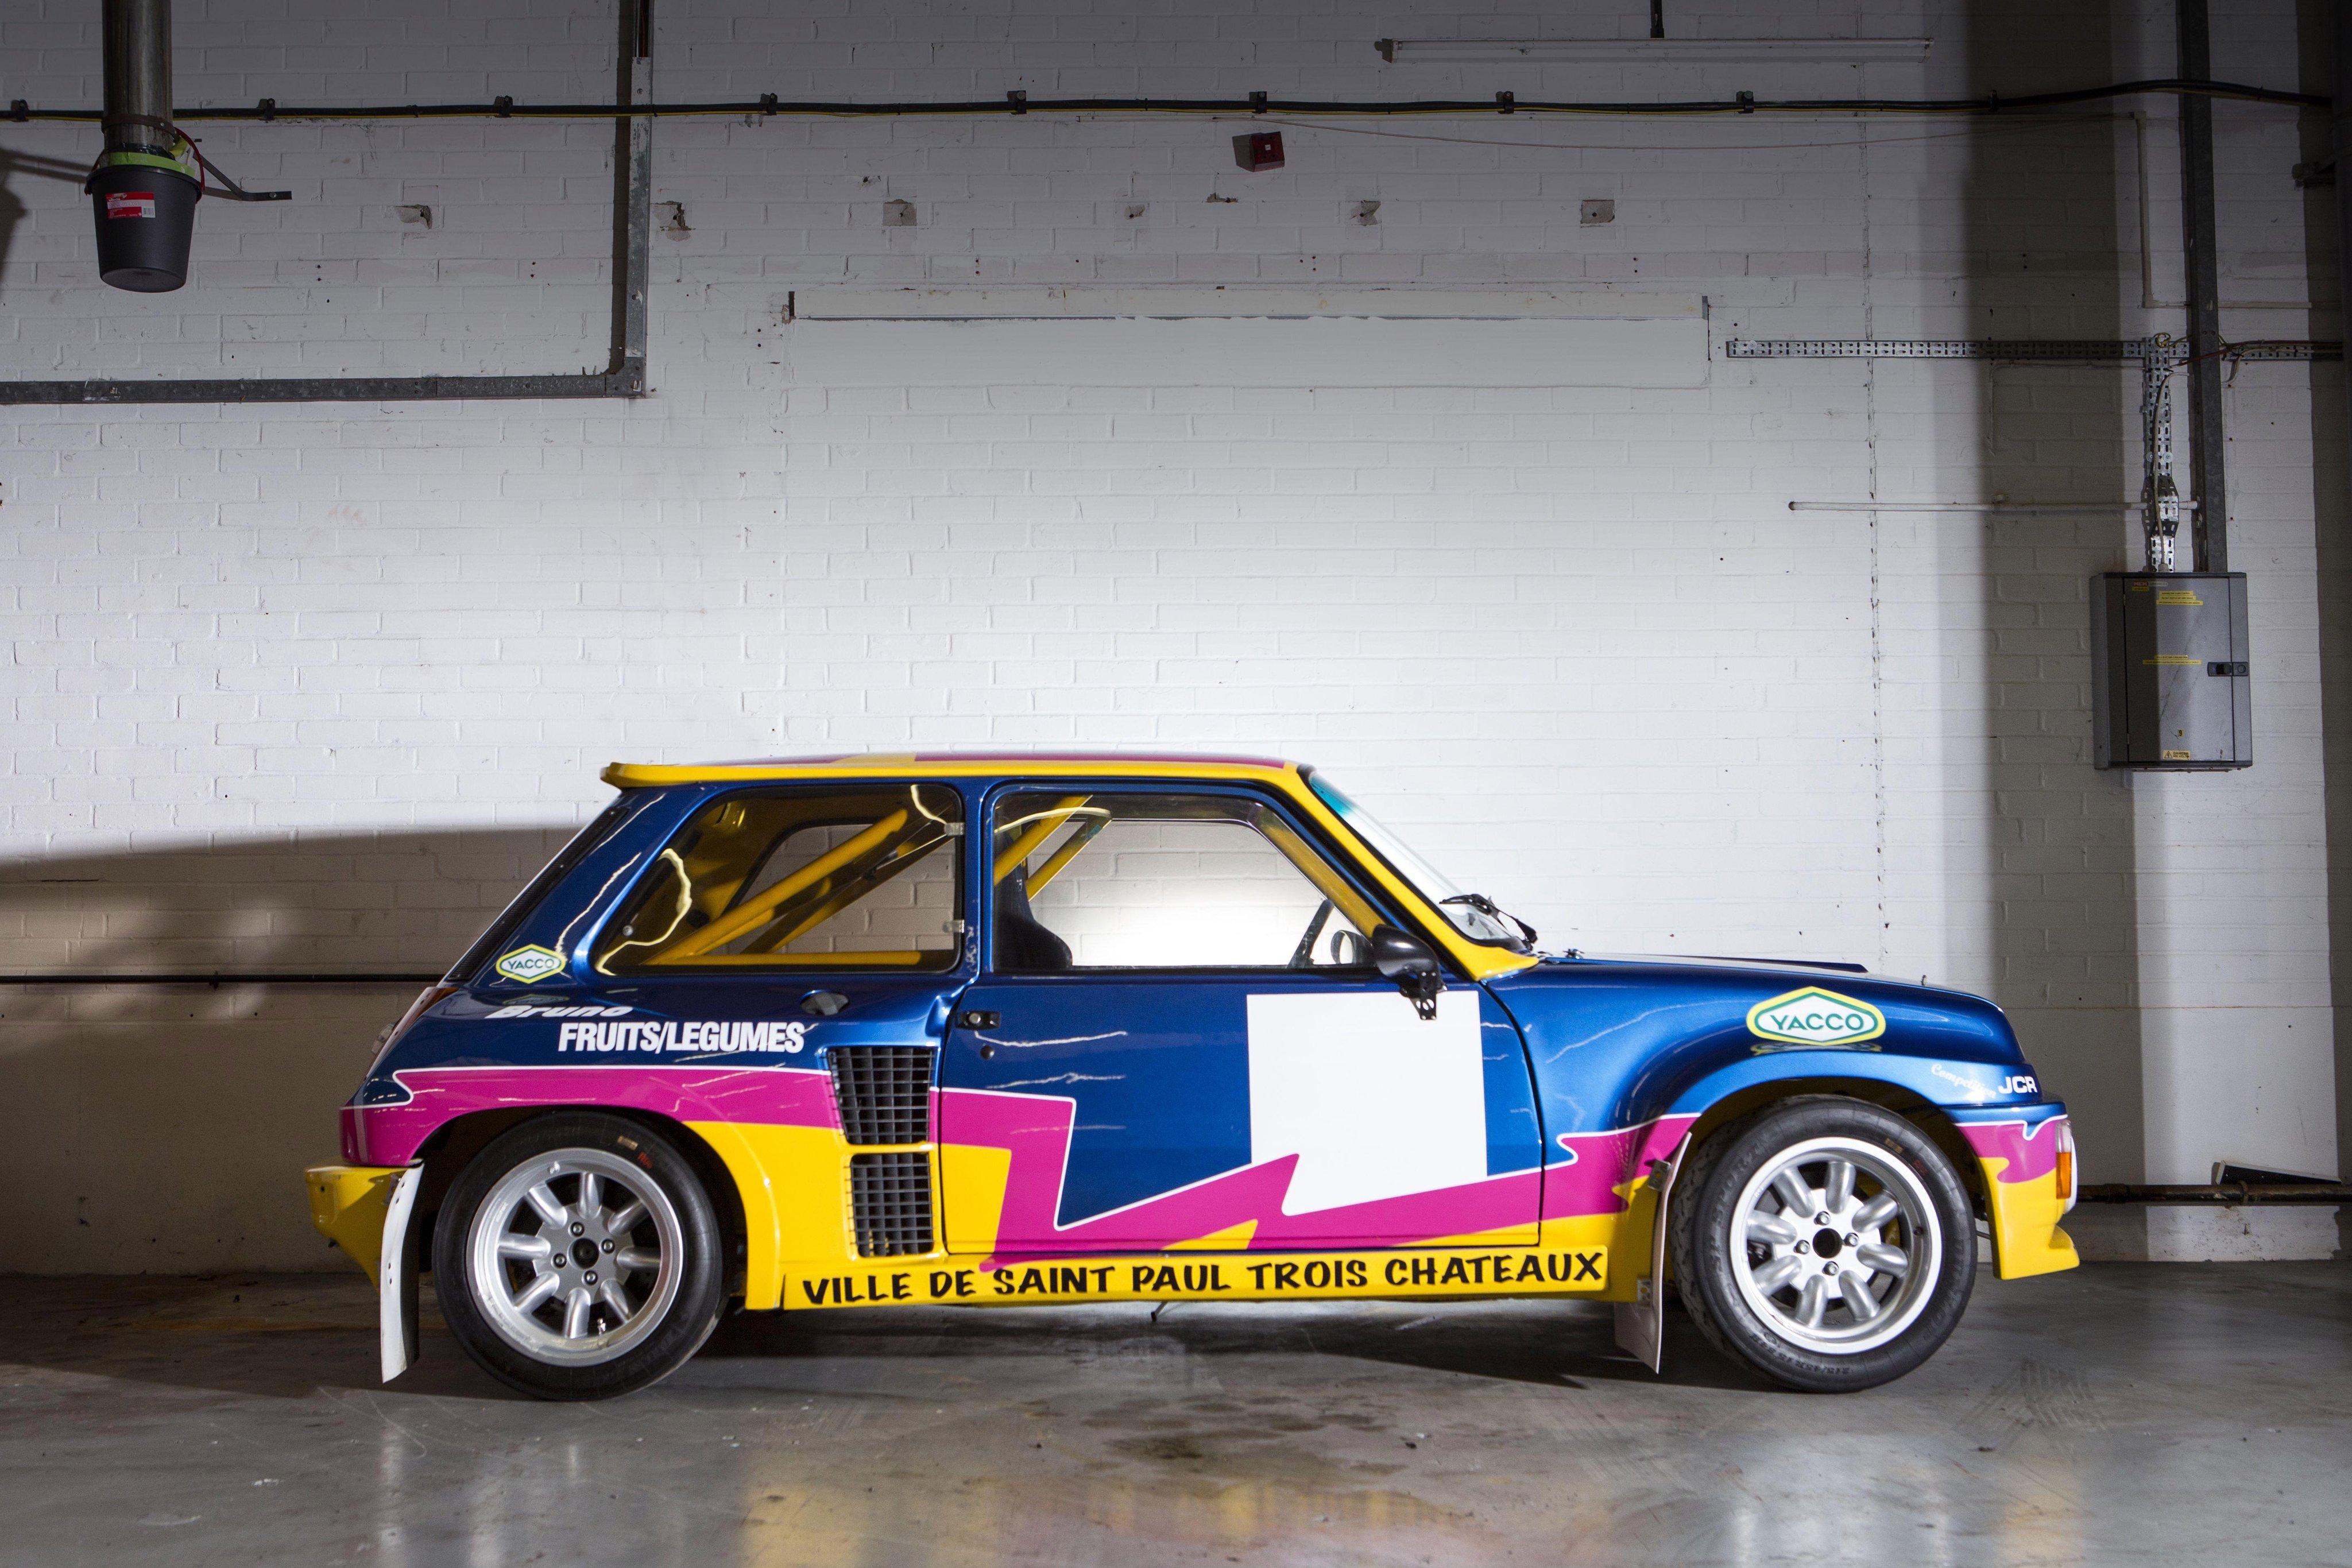 1983 renault 5 turbo tour de corse race racing wrc renault 5 wallpaper 4096x2731 557334. Black Bedroom Furniture Sets. Home Design Ideas